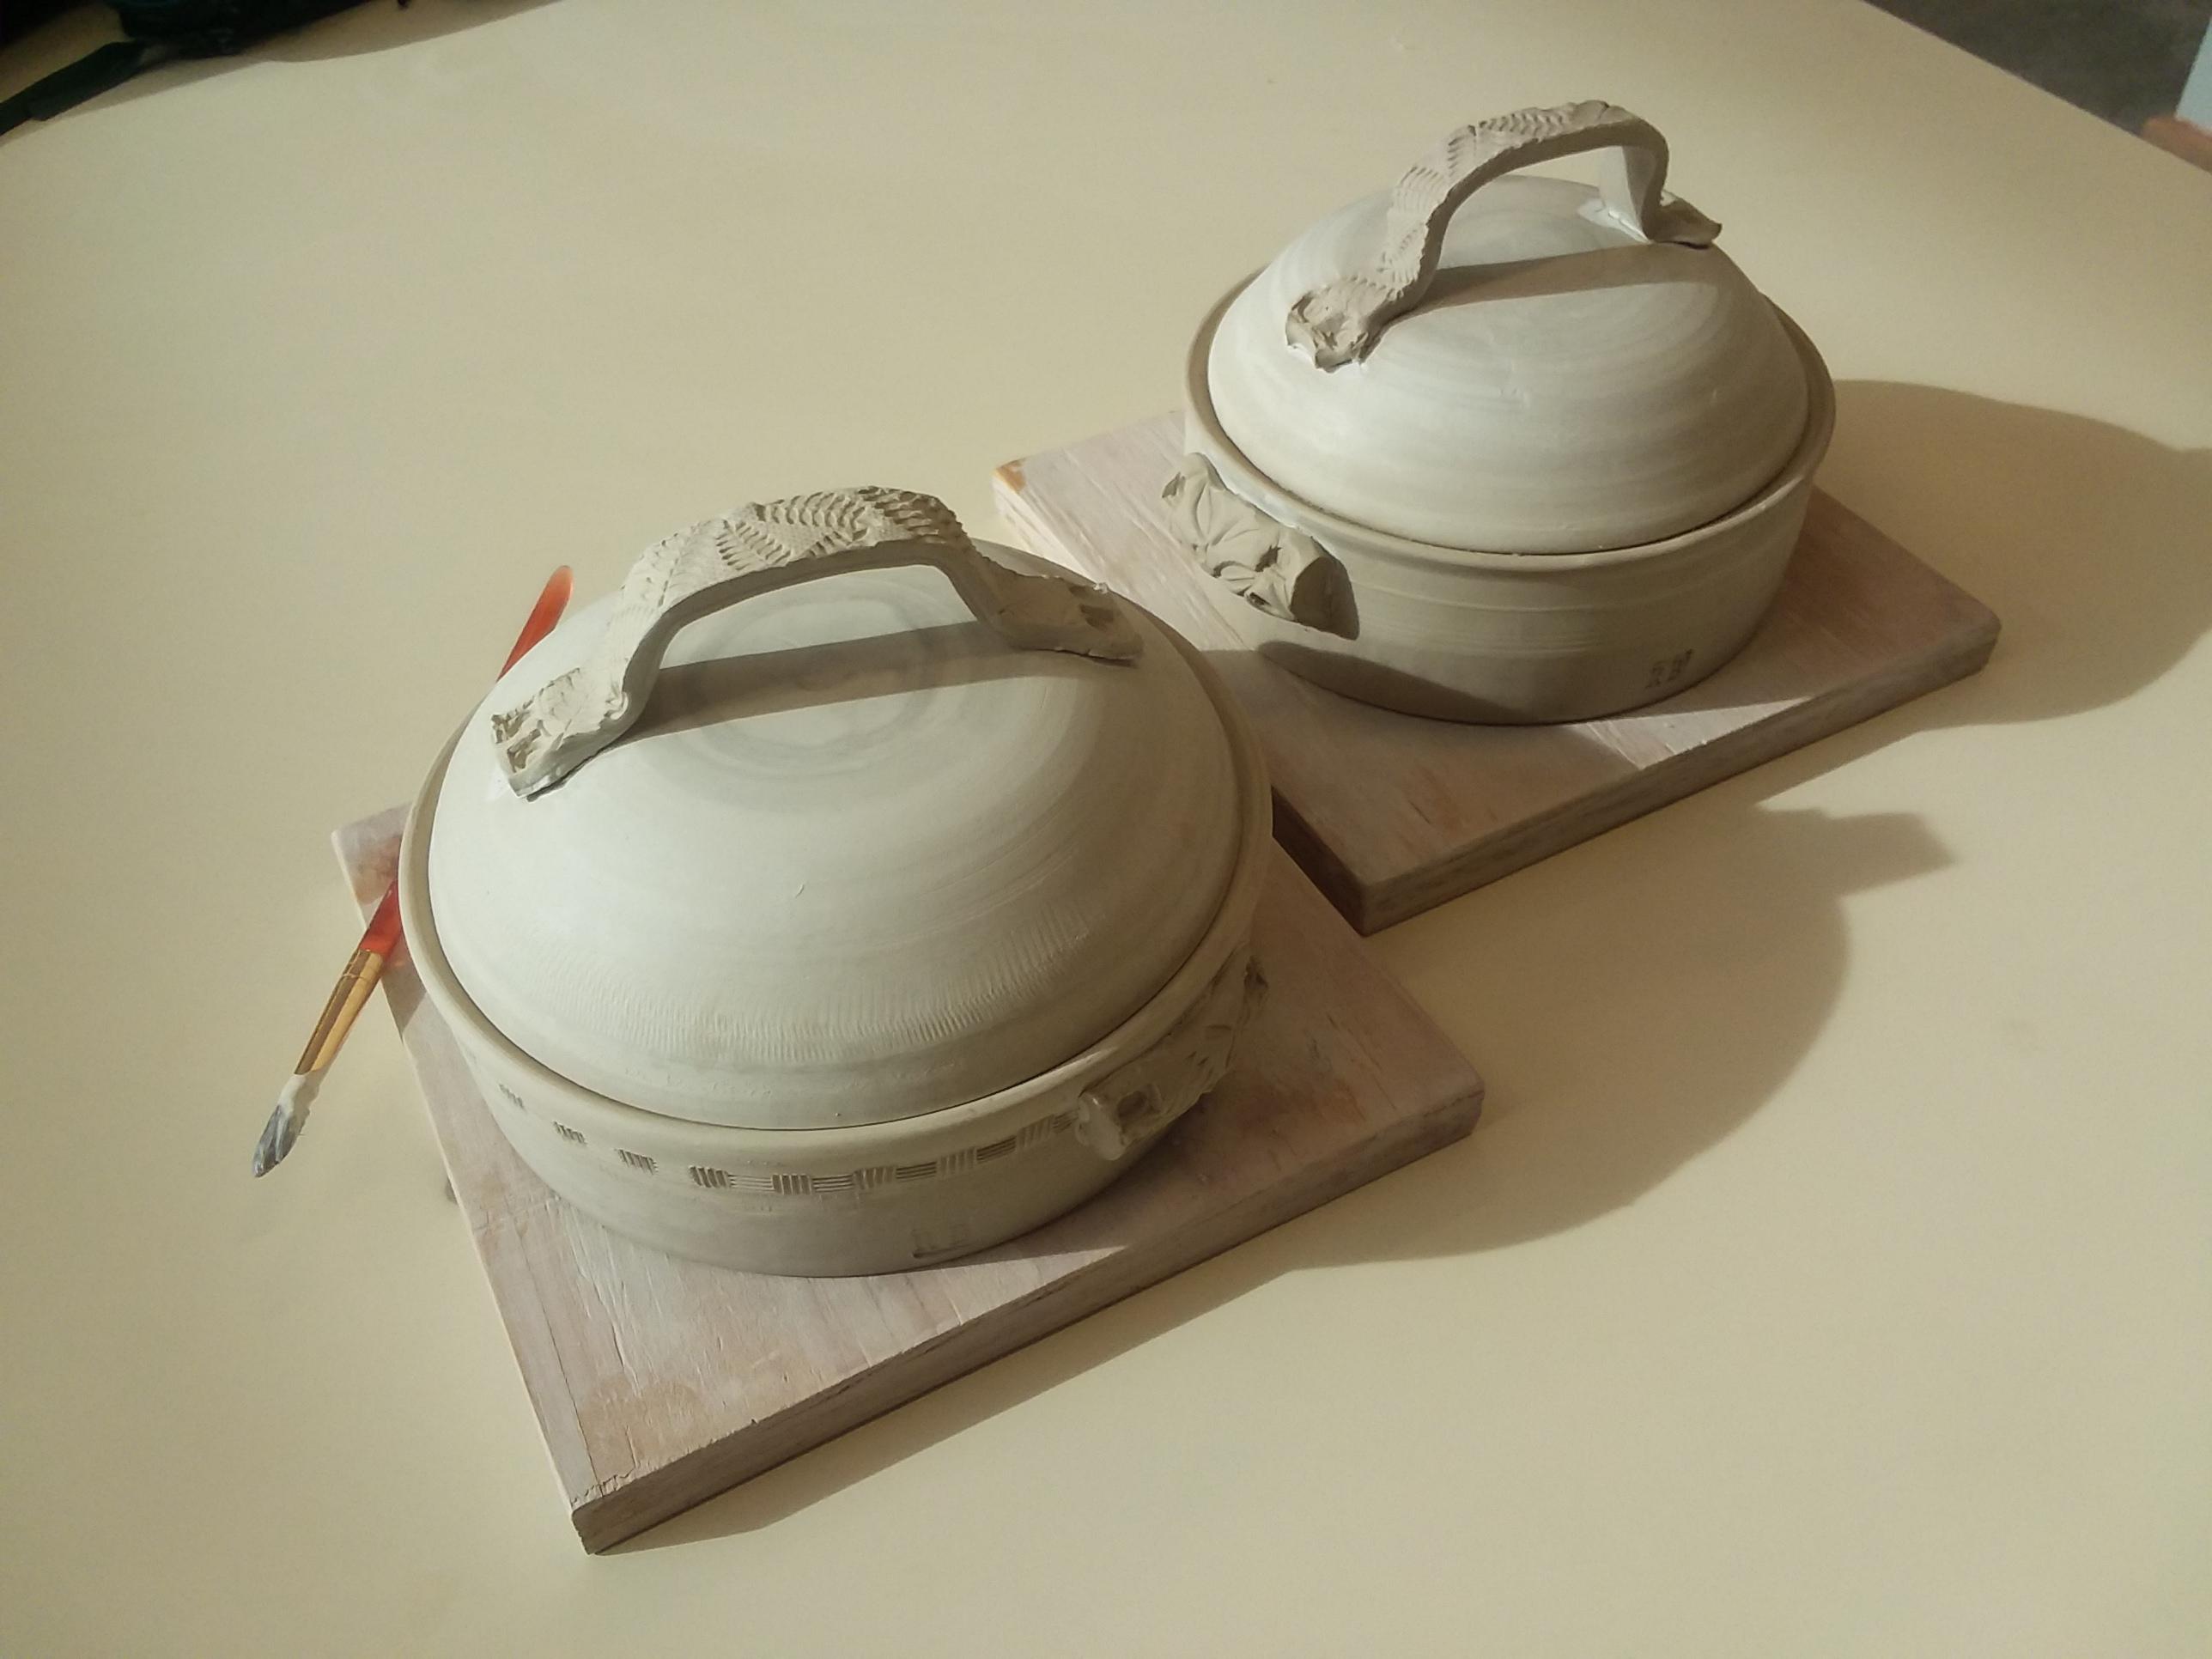 casorole dish in process